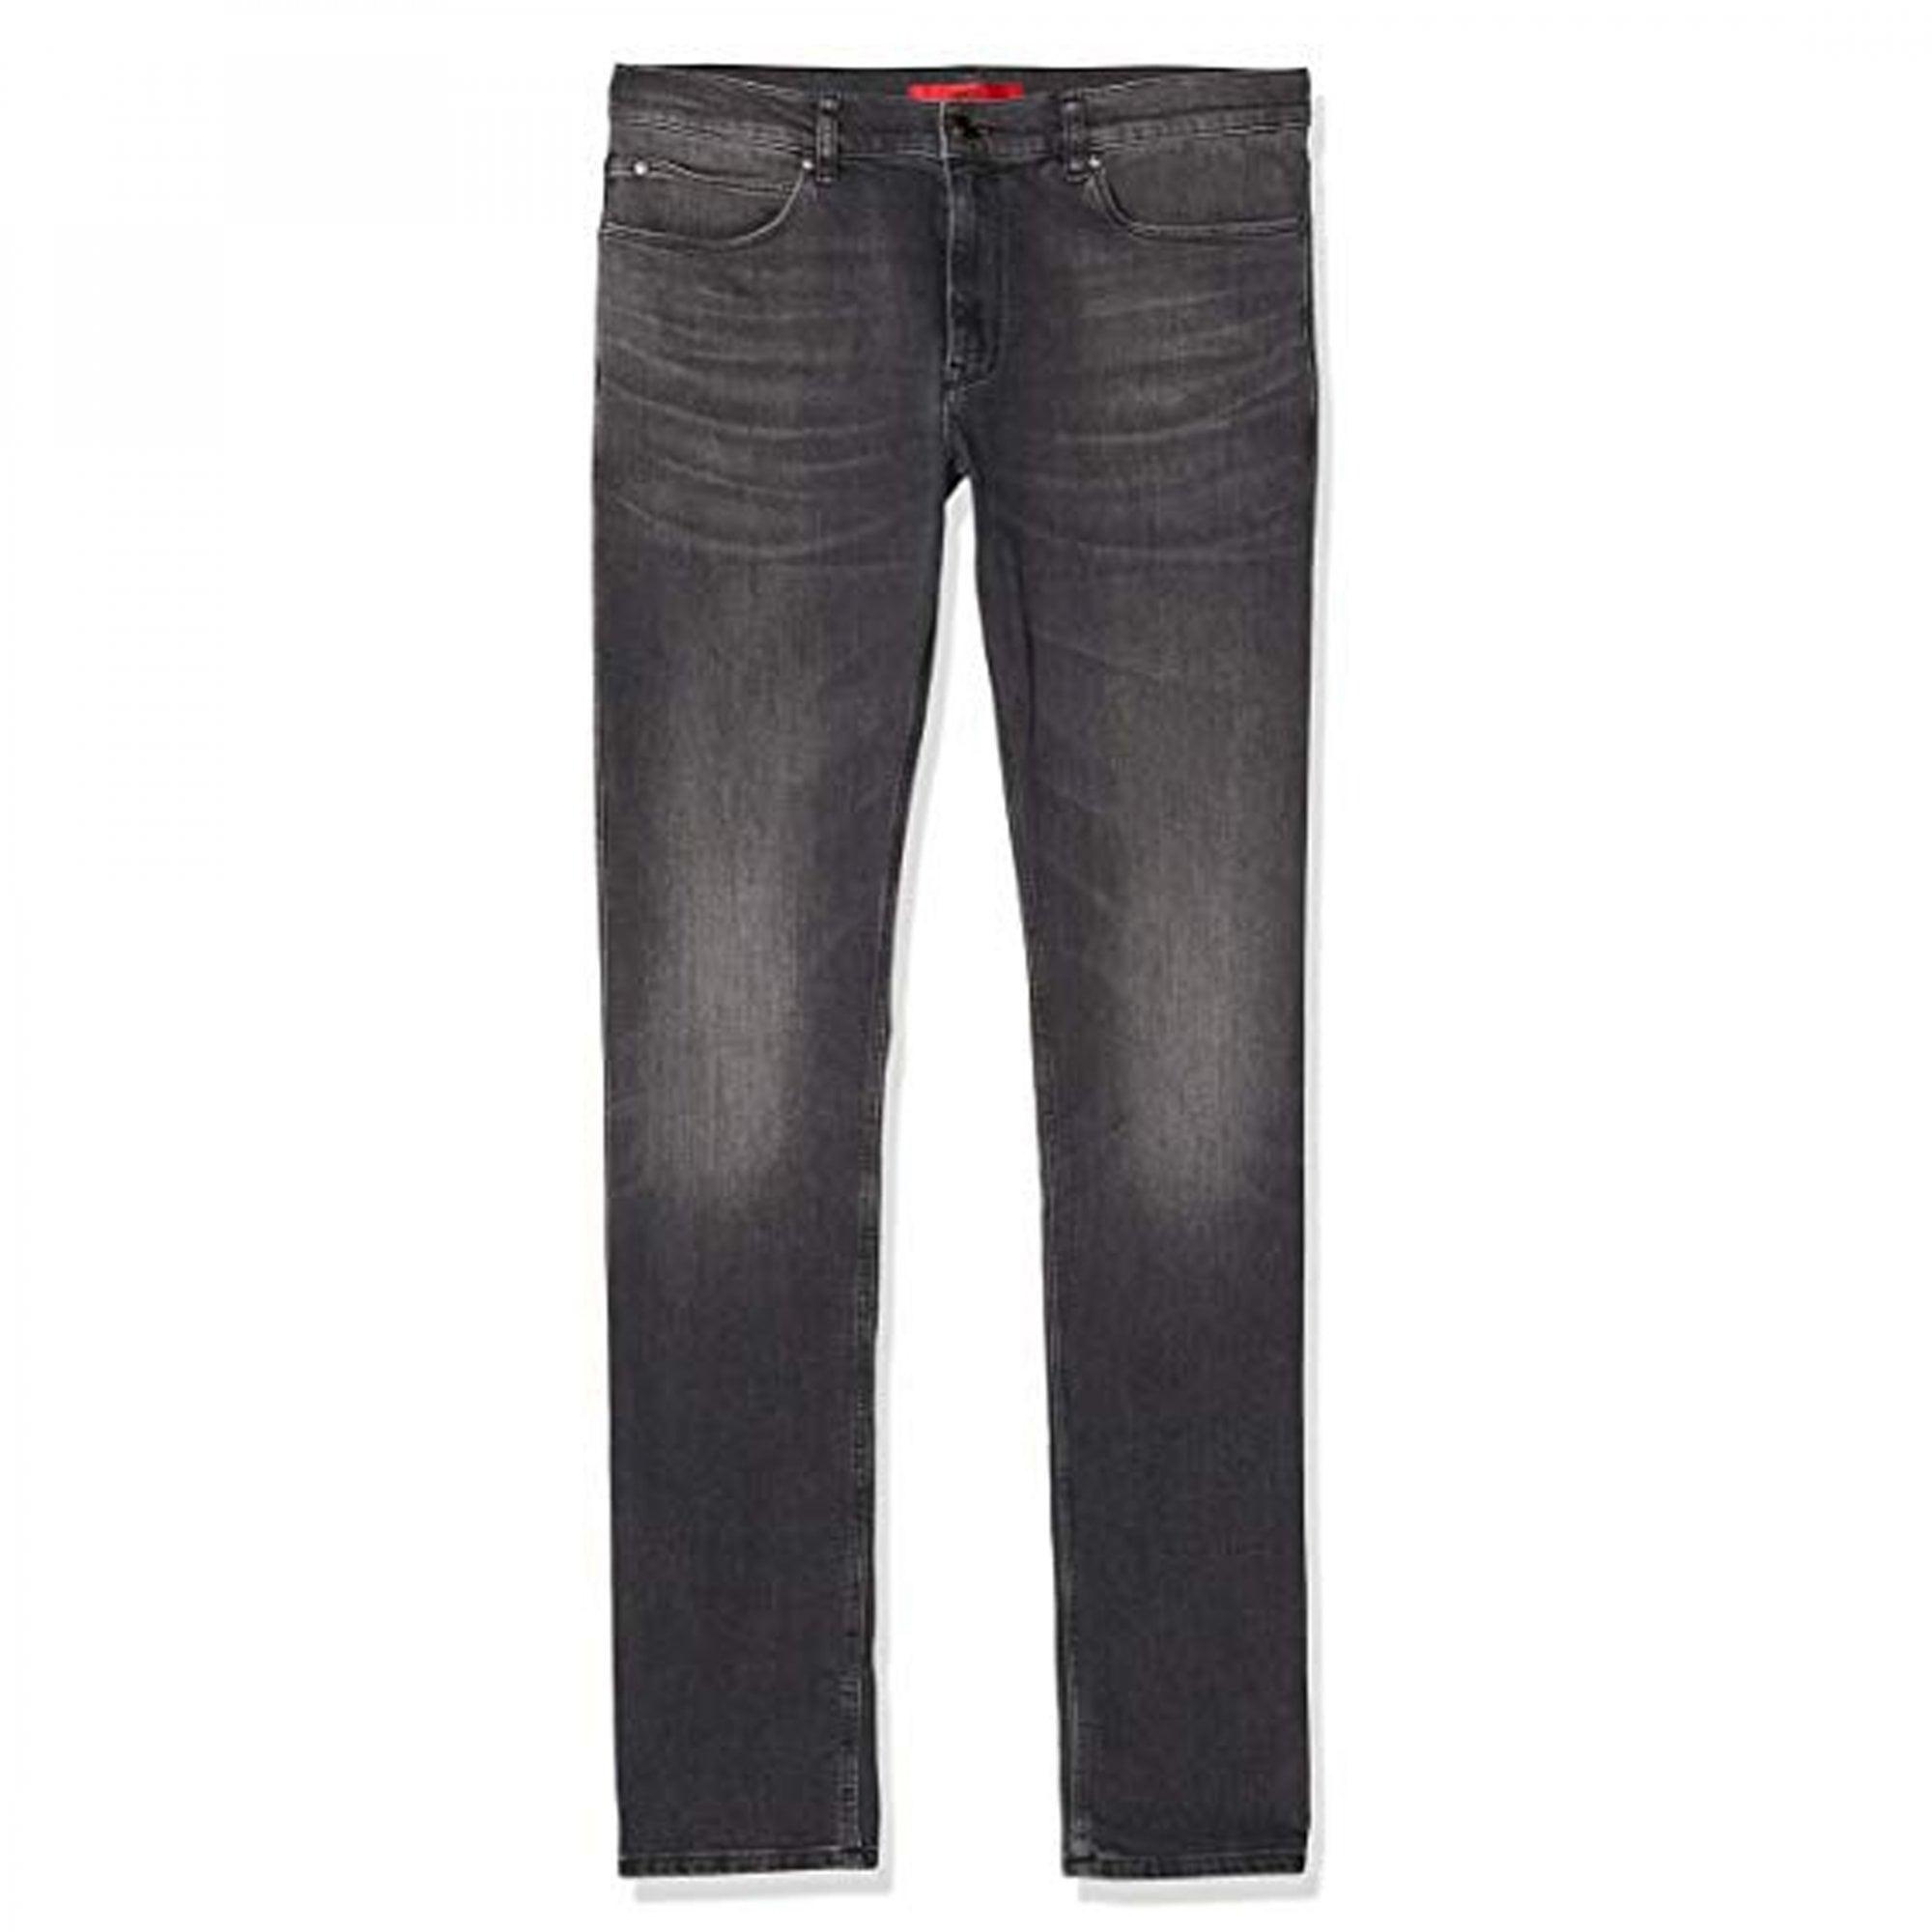 Hugo Boss 734 Gris Délavé Skinny Jeans 020 50426680